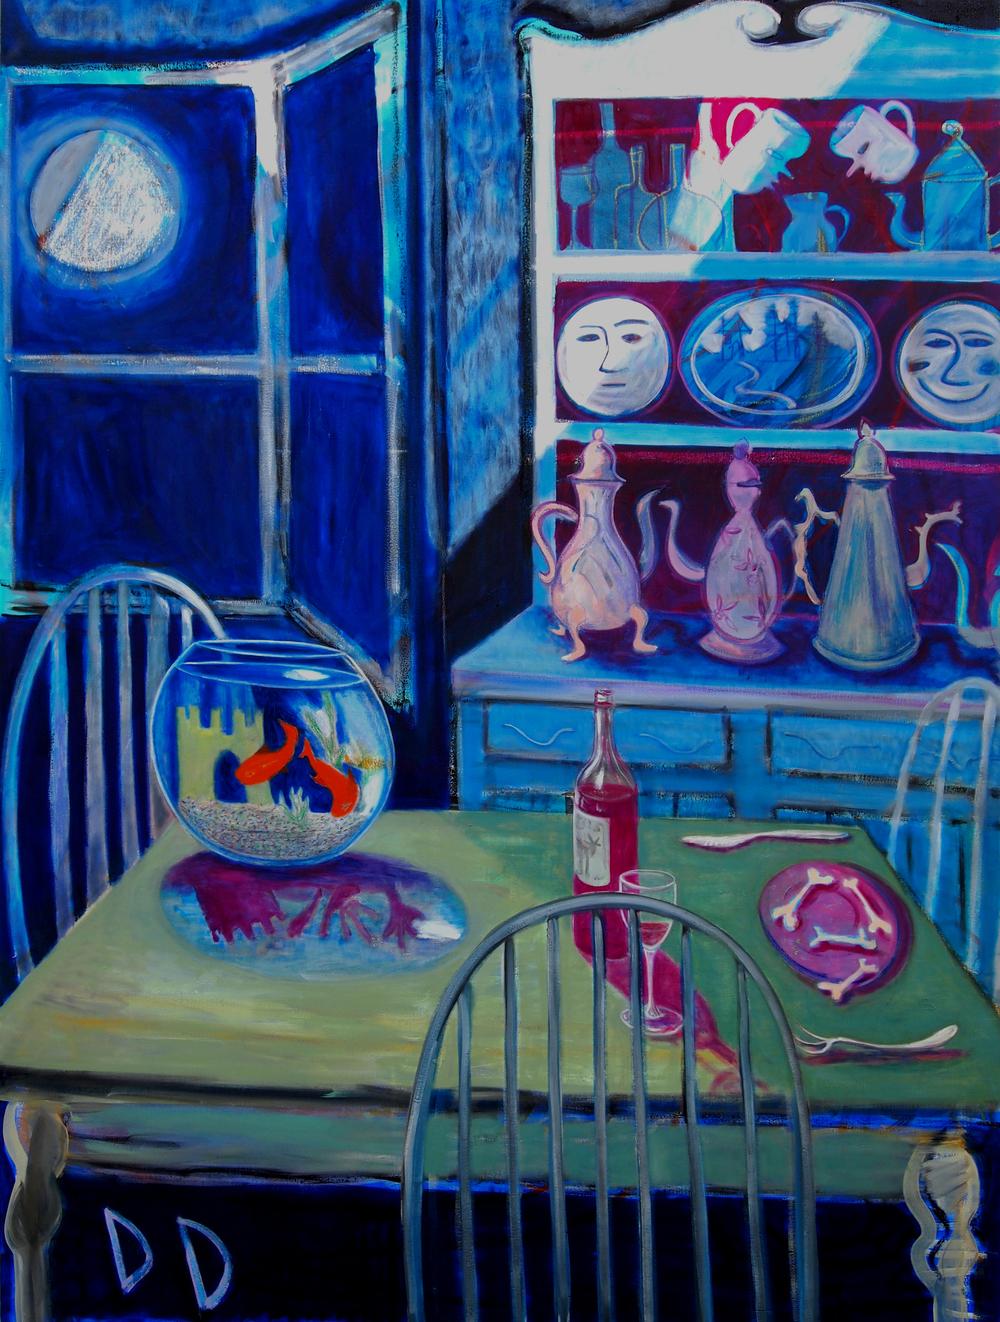 Moon in a Blue Room  Oil on Linen  150 x 200cm